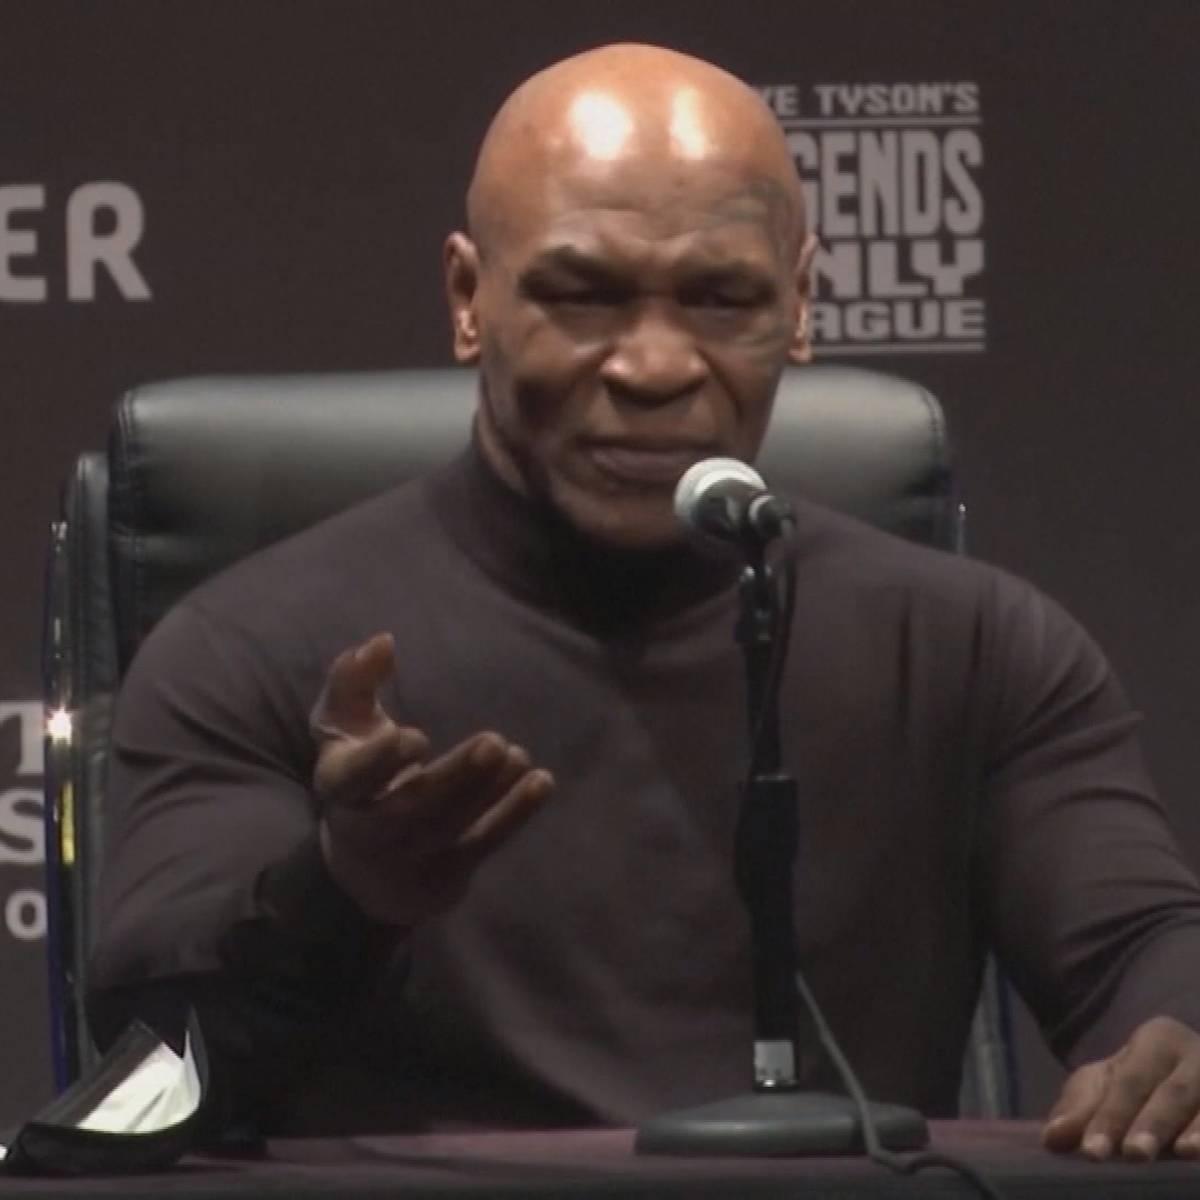 Nach Comeback: Tyson denkt schon an den nächsten Fight